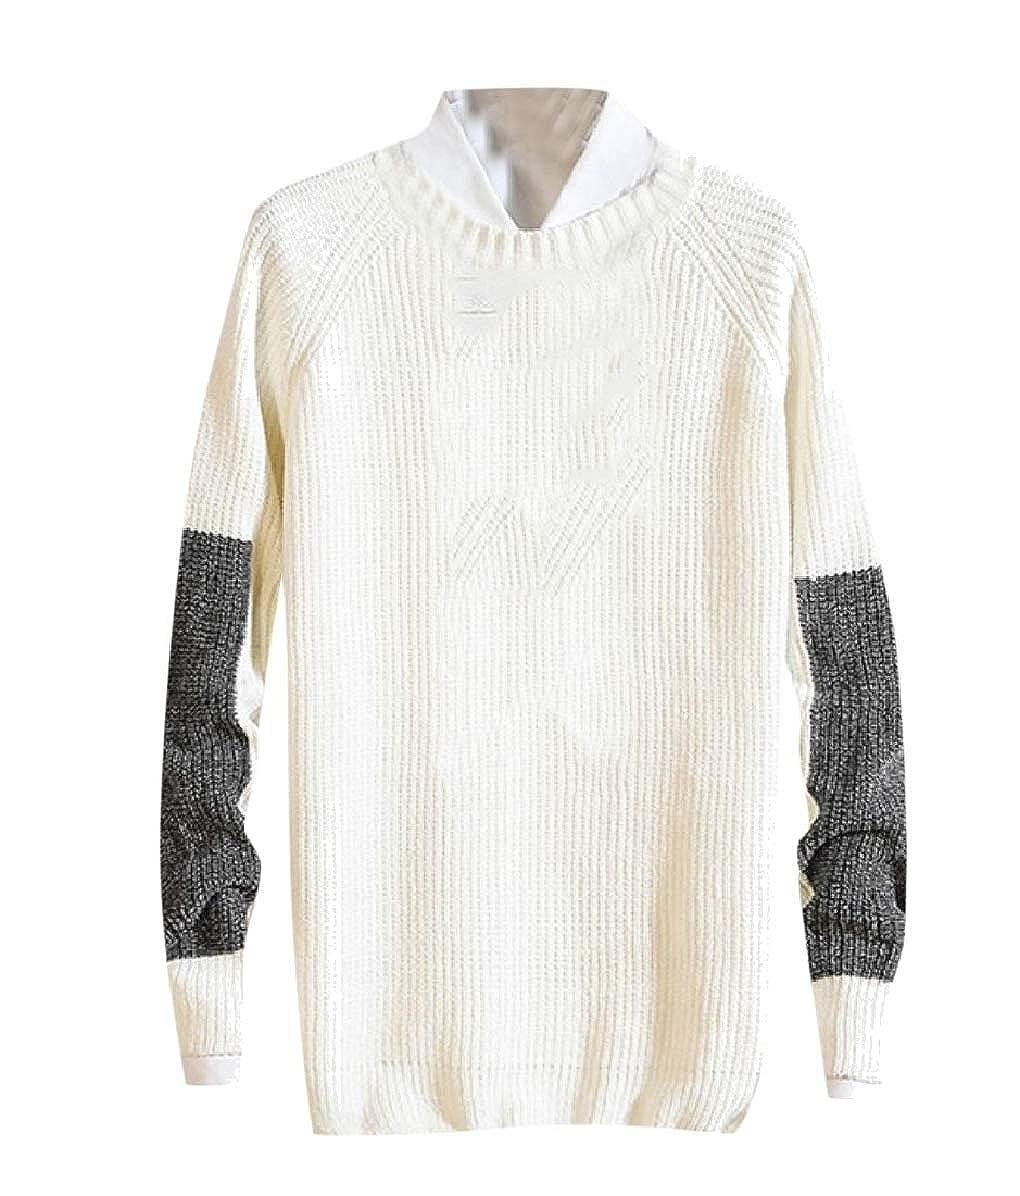 Zimaes-Men Assorted Colors Crewneck Winter Knit Jumper Pullover Sweater